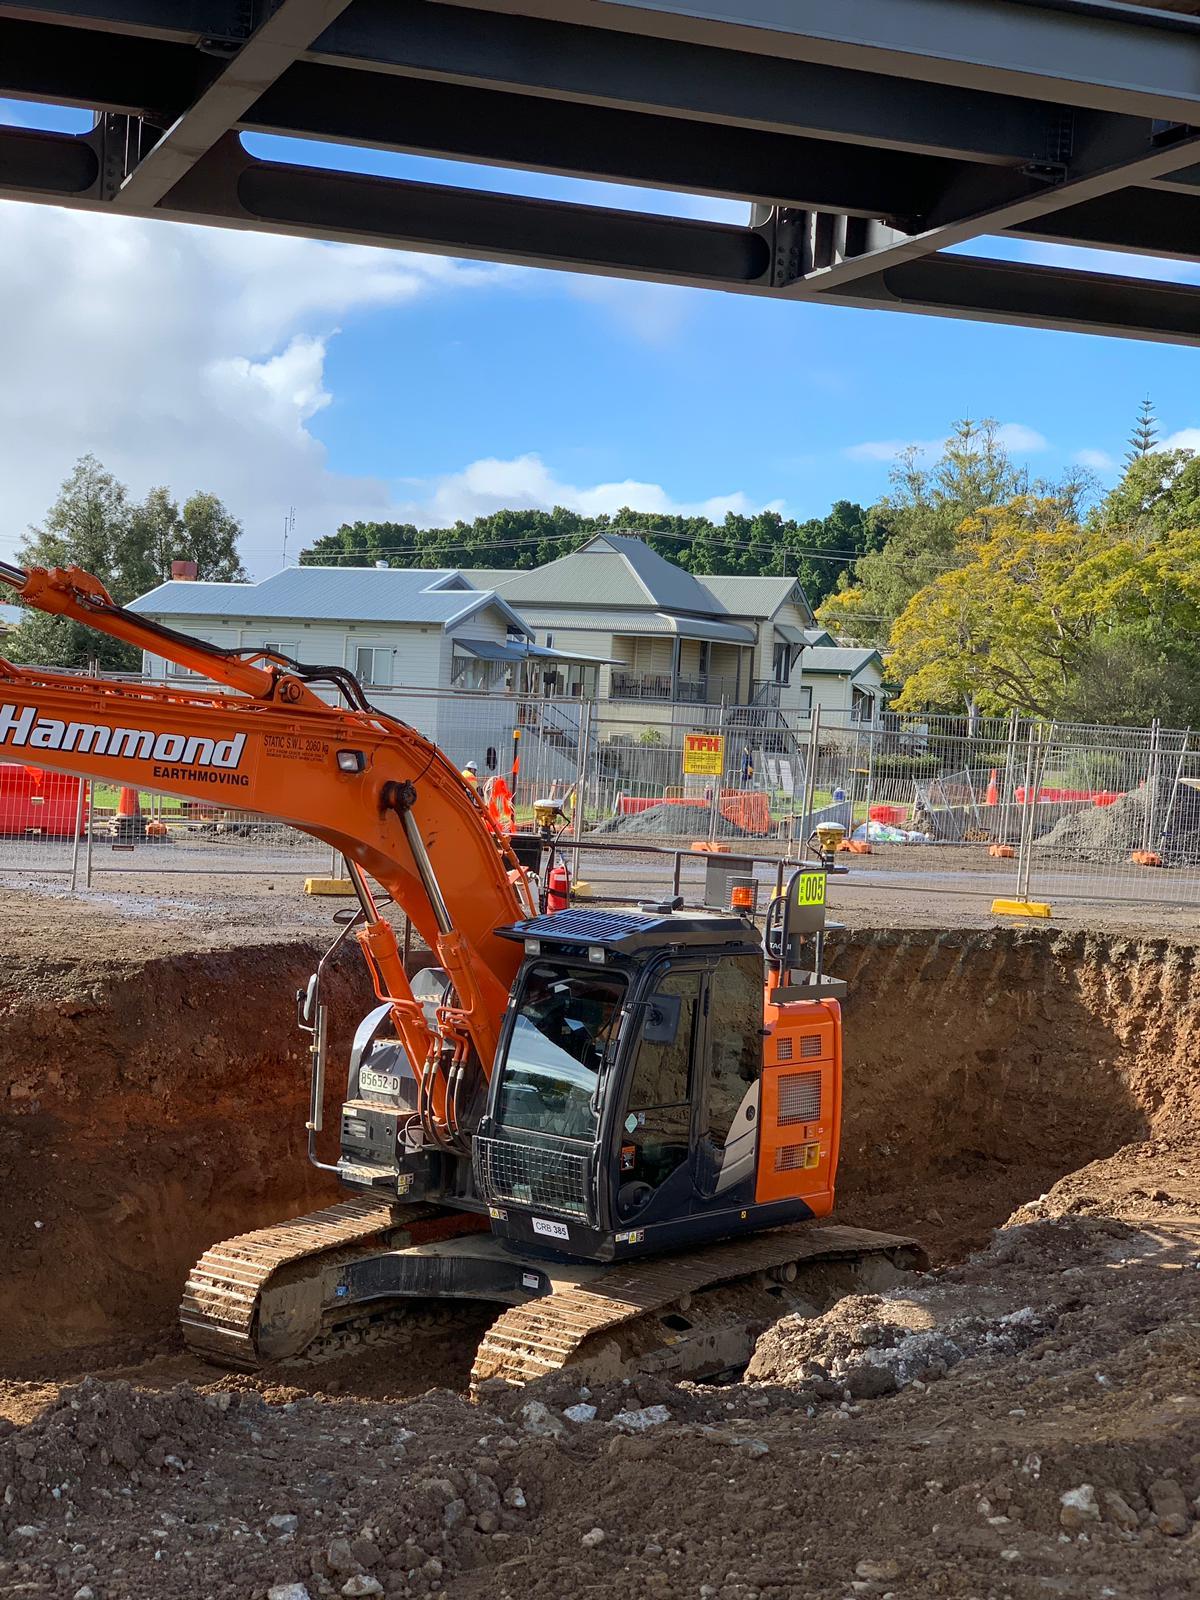 hammond-earthmoving-hire-excavators-brisbane